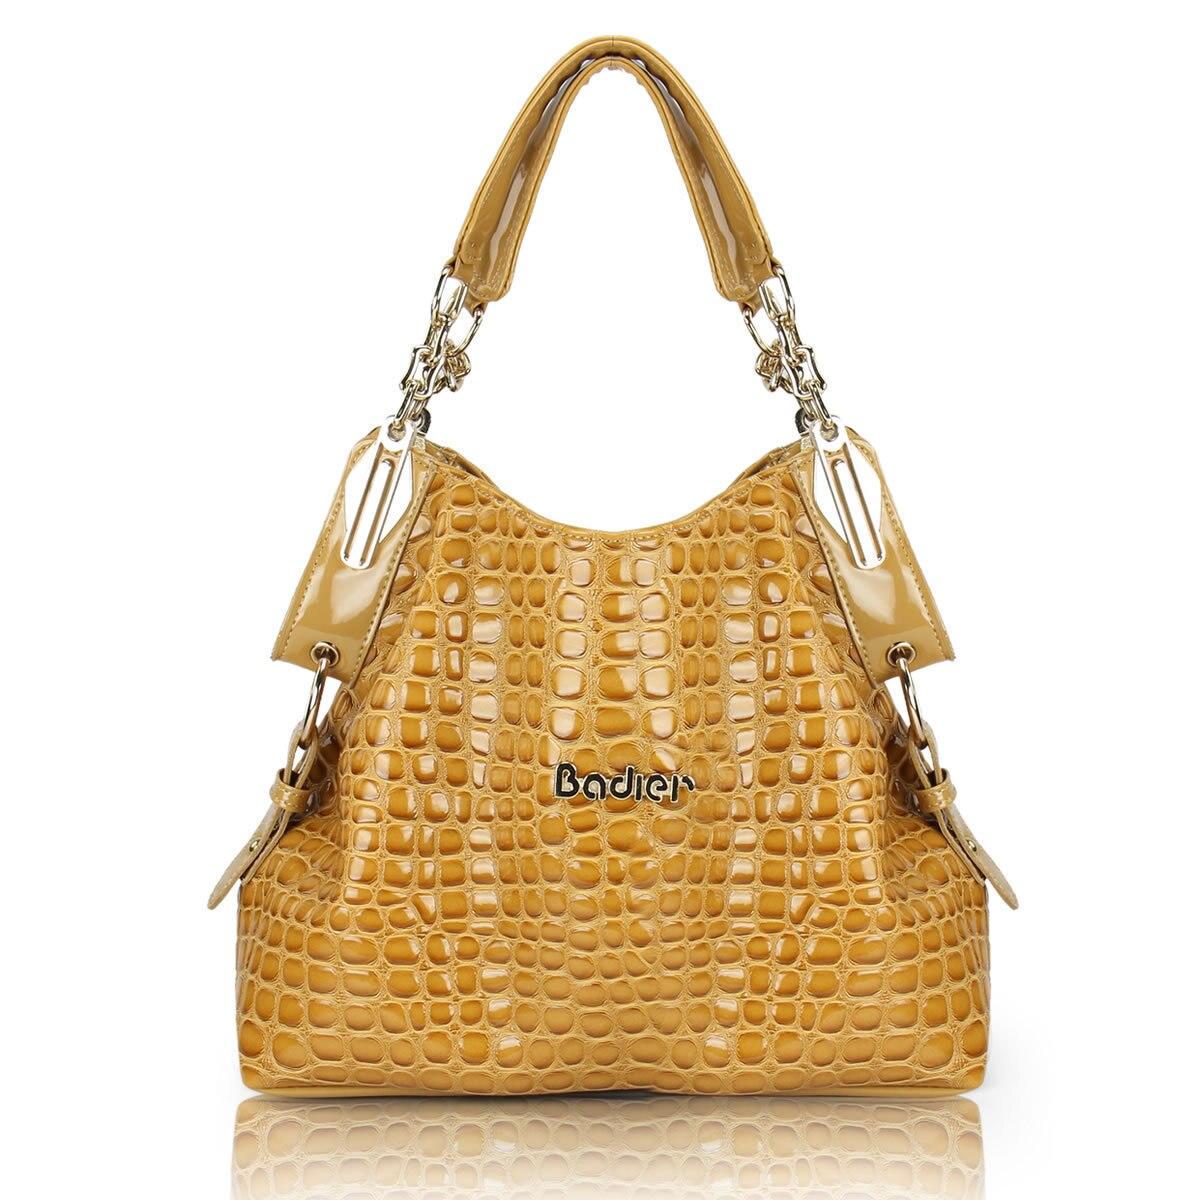 2013 spring and summer women's handbag all-match fashion chain bag shoulder bag cross-body women's brief work bag